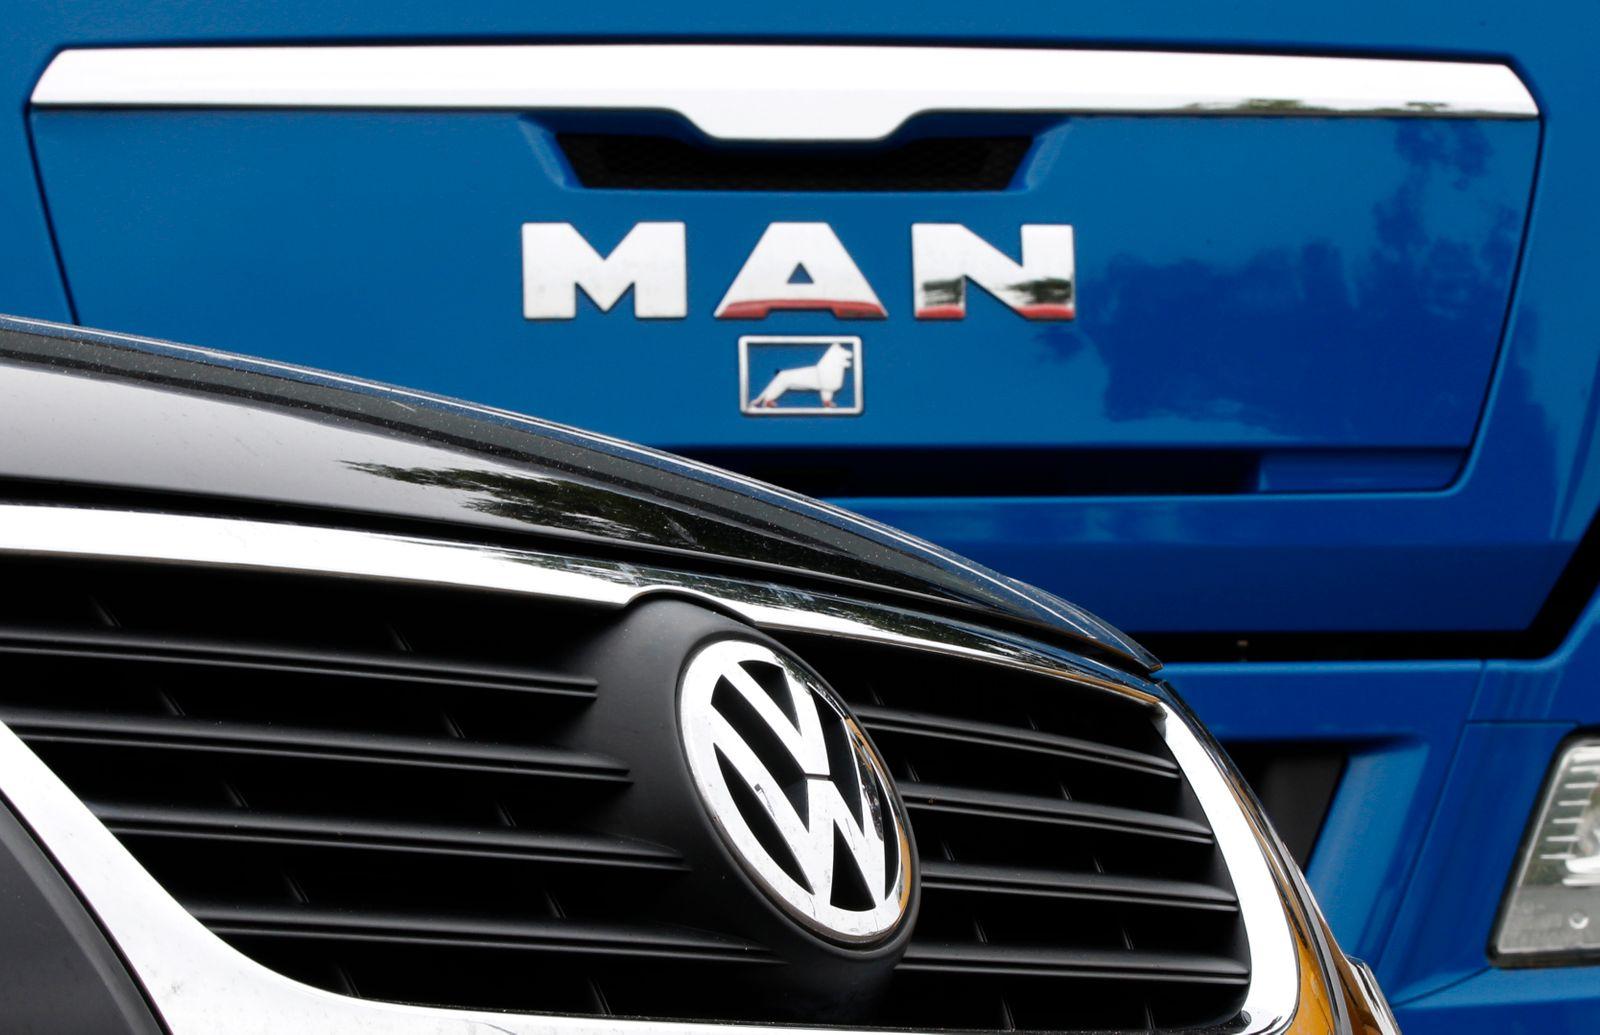 Man / VW / LKW / Truck / Logo